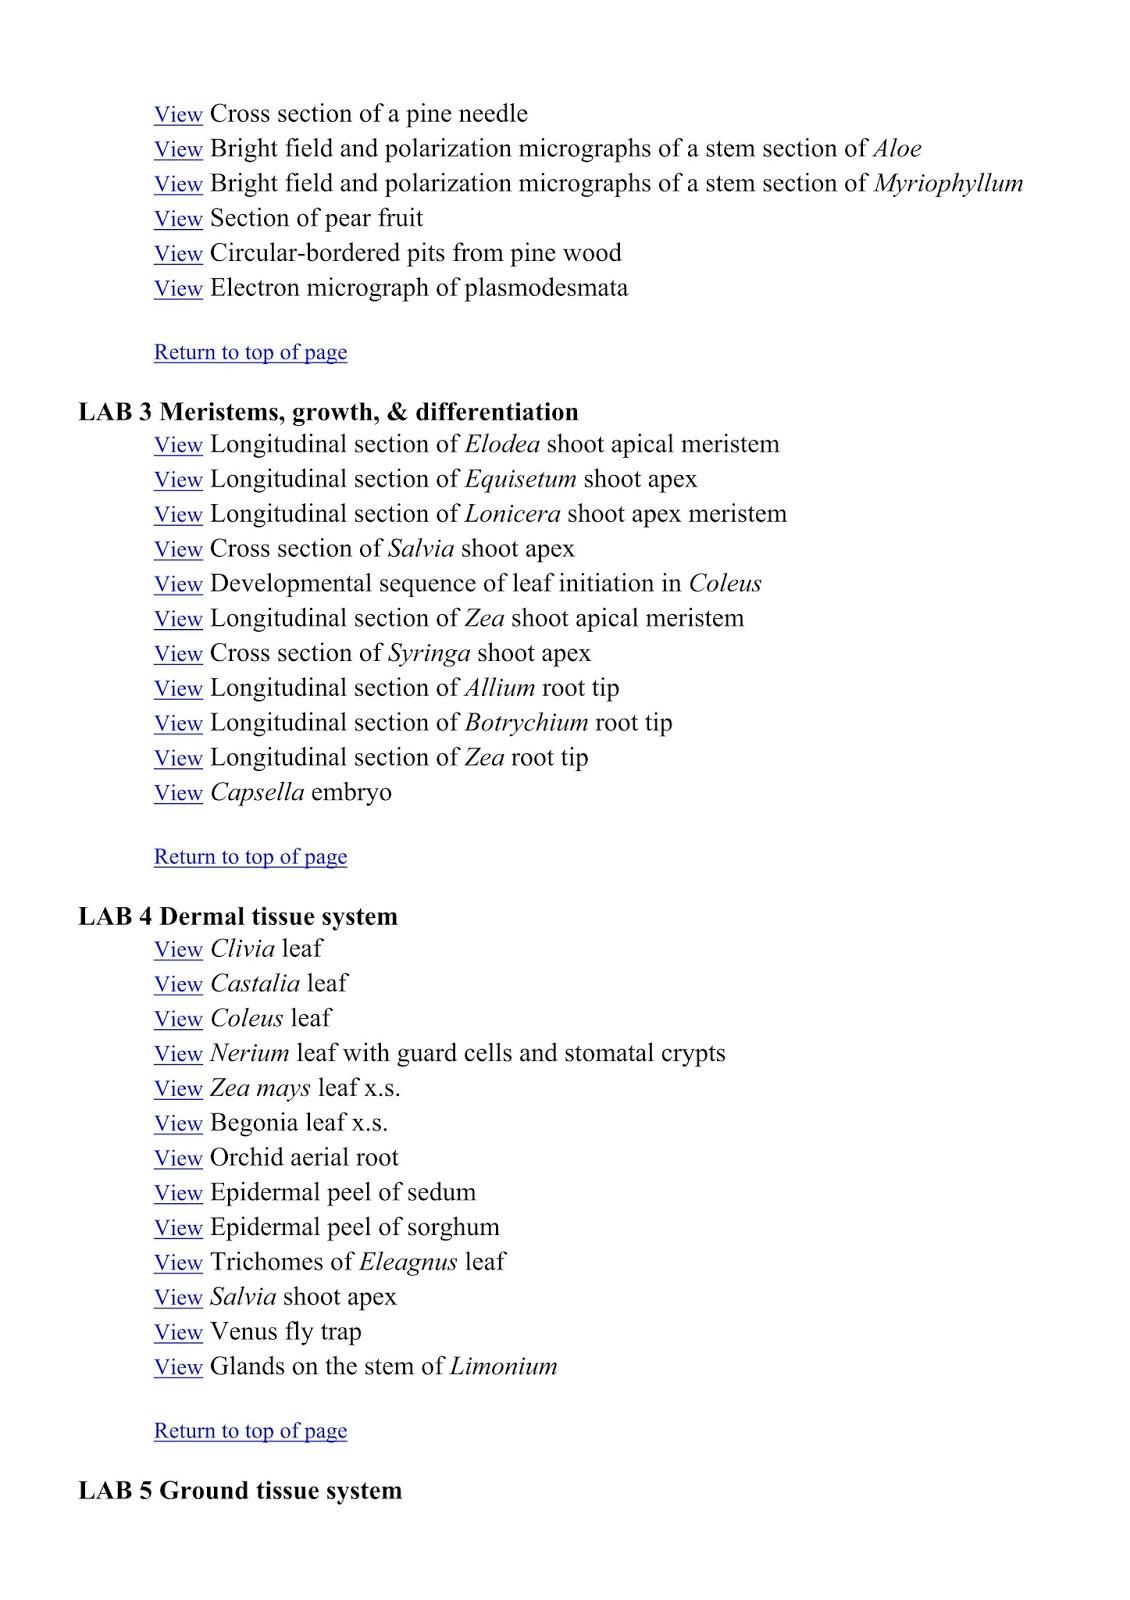 Alison Roberts 2002 Plant Anatomy Bio311 Plant Books